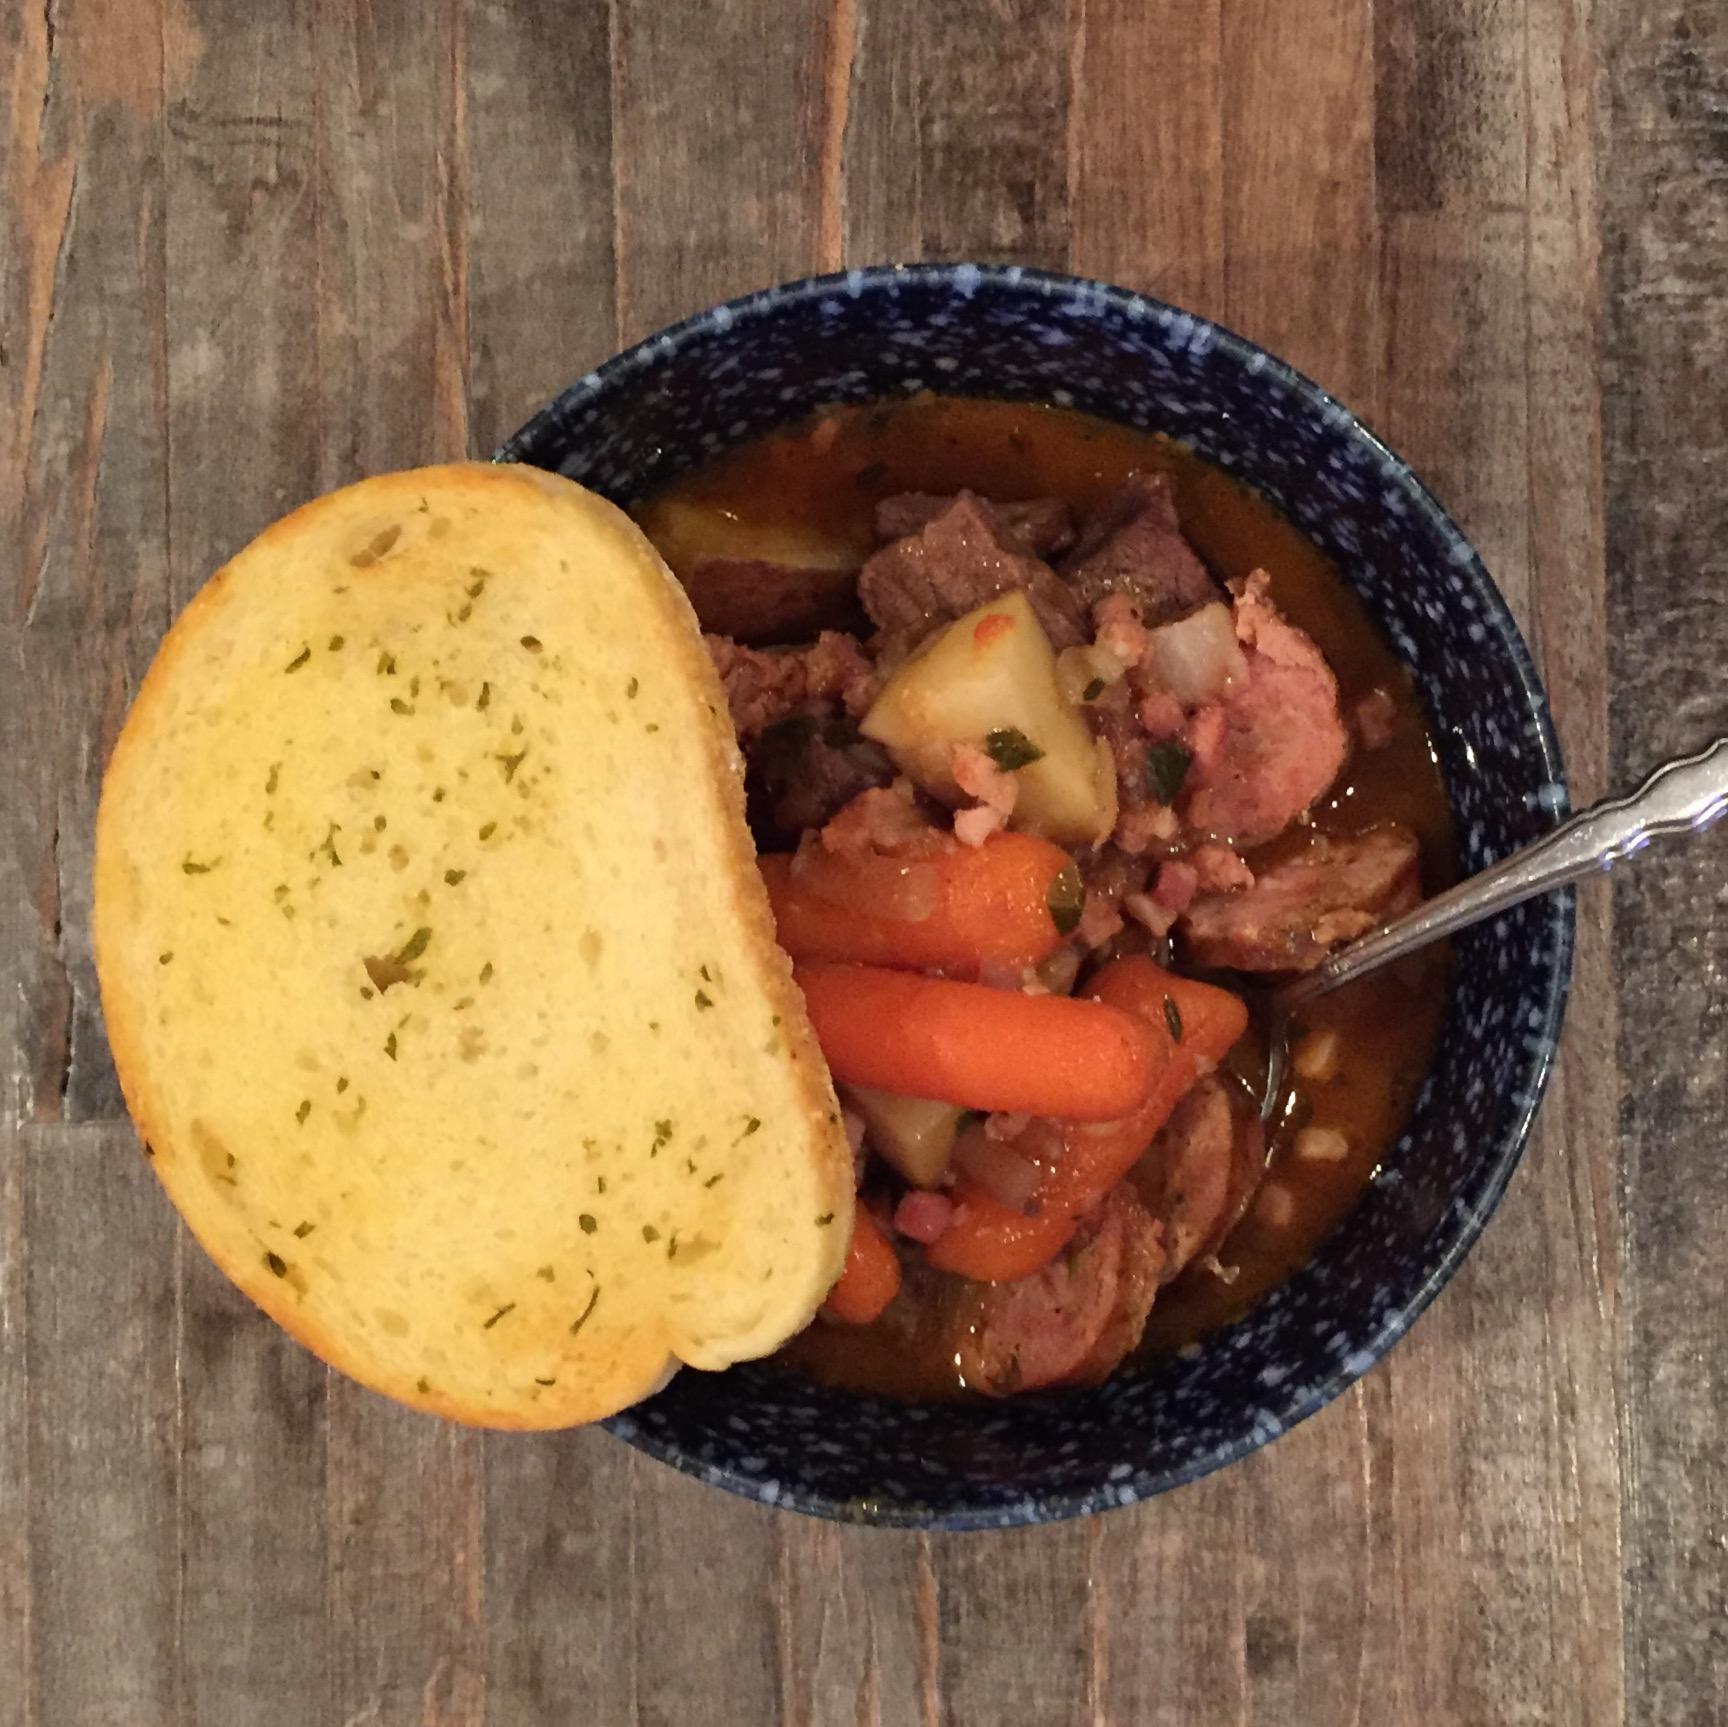 Quick & Easy Week Night Dinner - Beef Stew, Casey Bonano RD, LD, Dallas Nutritional Counseling #dallasnutritionalcounseling #balancedeating #homecooking #quickrecipes #easyrecipe #weeknightrecipe #carbfatpro #quickeasyrecipe